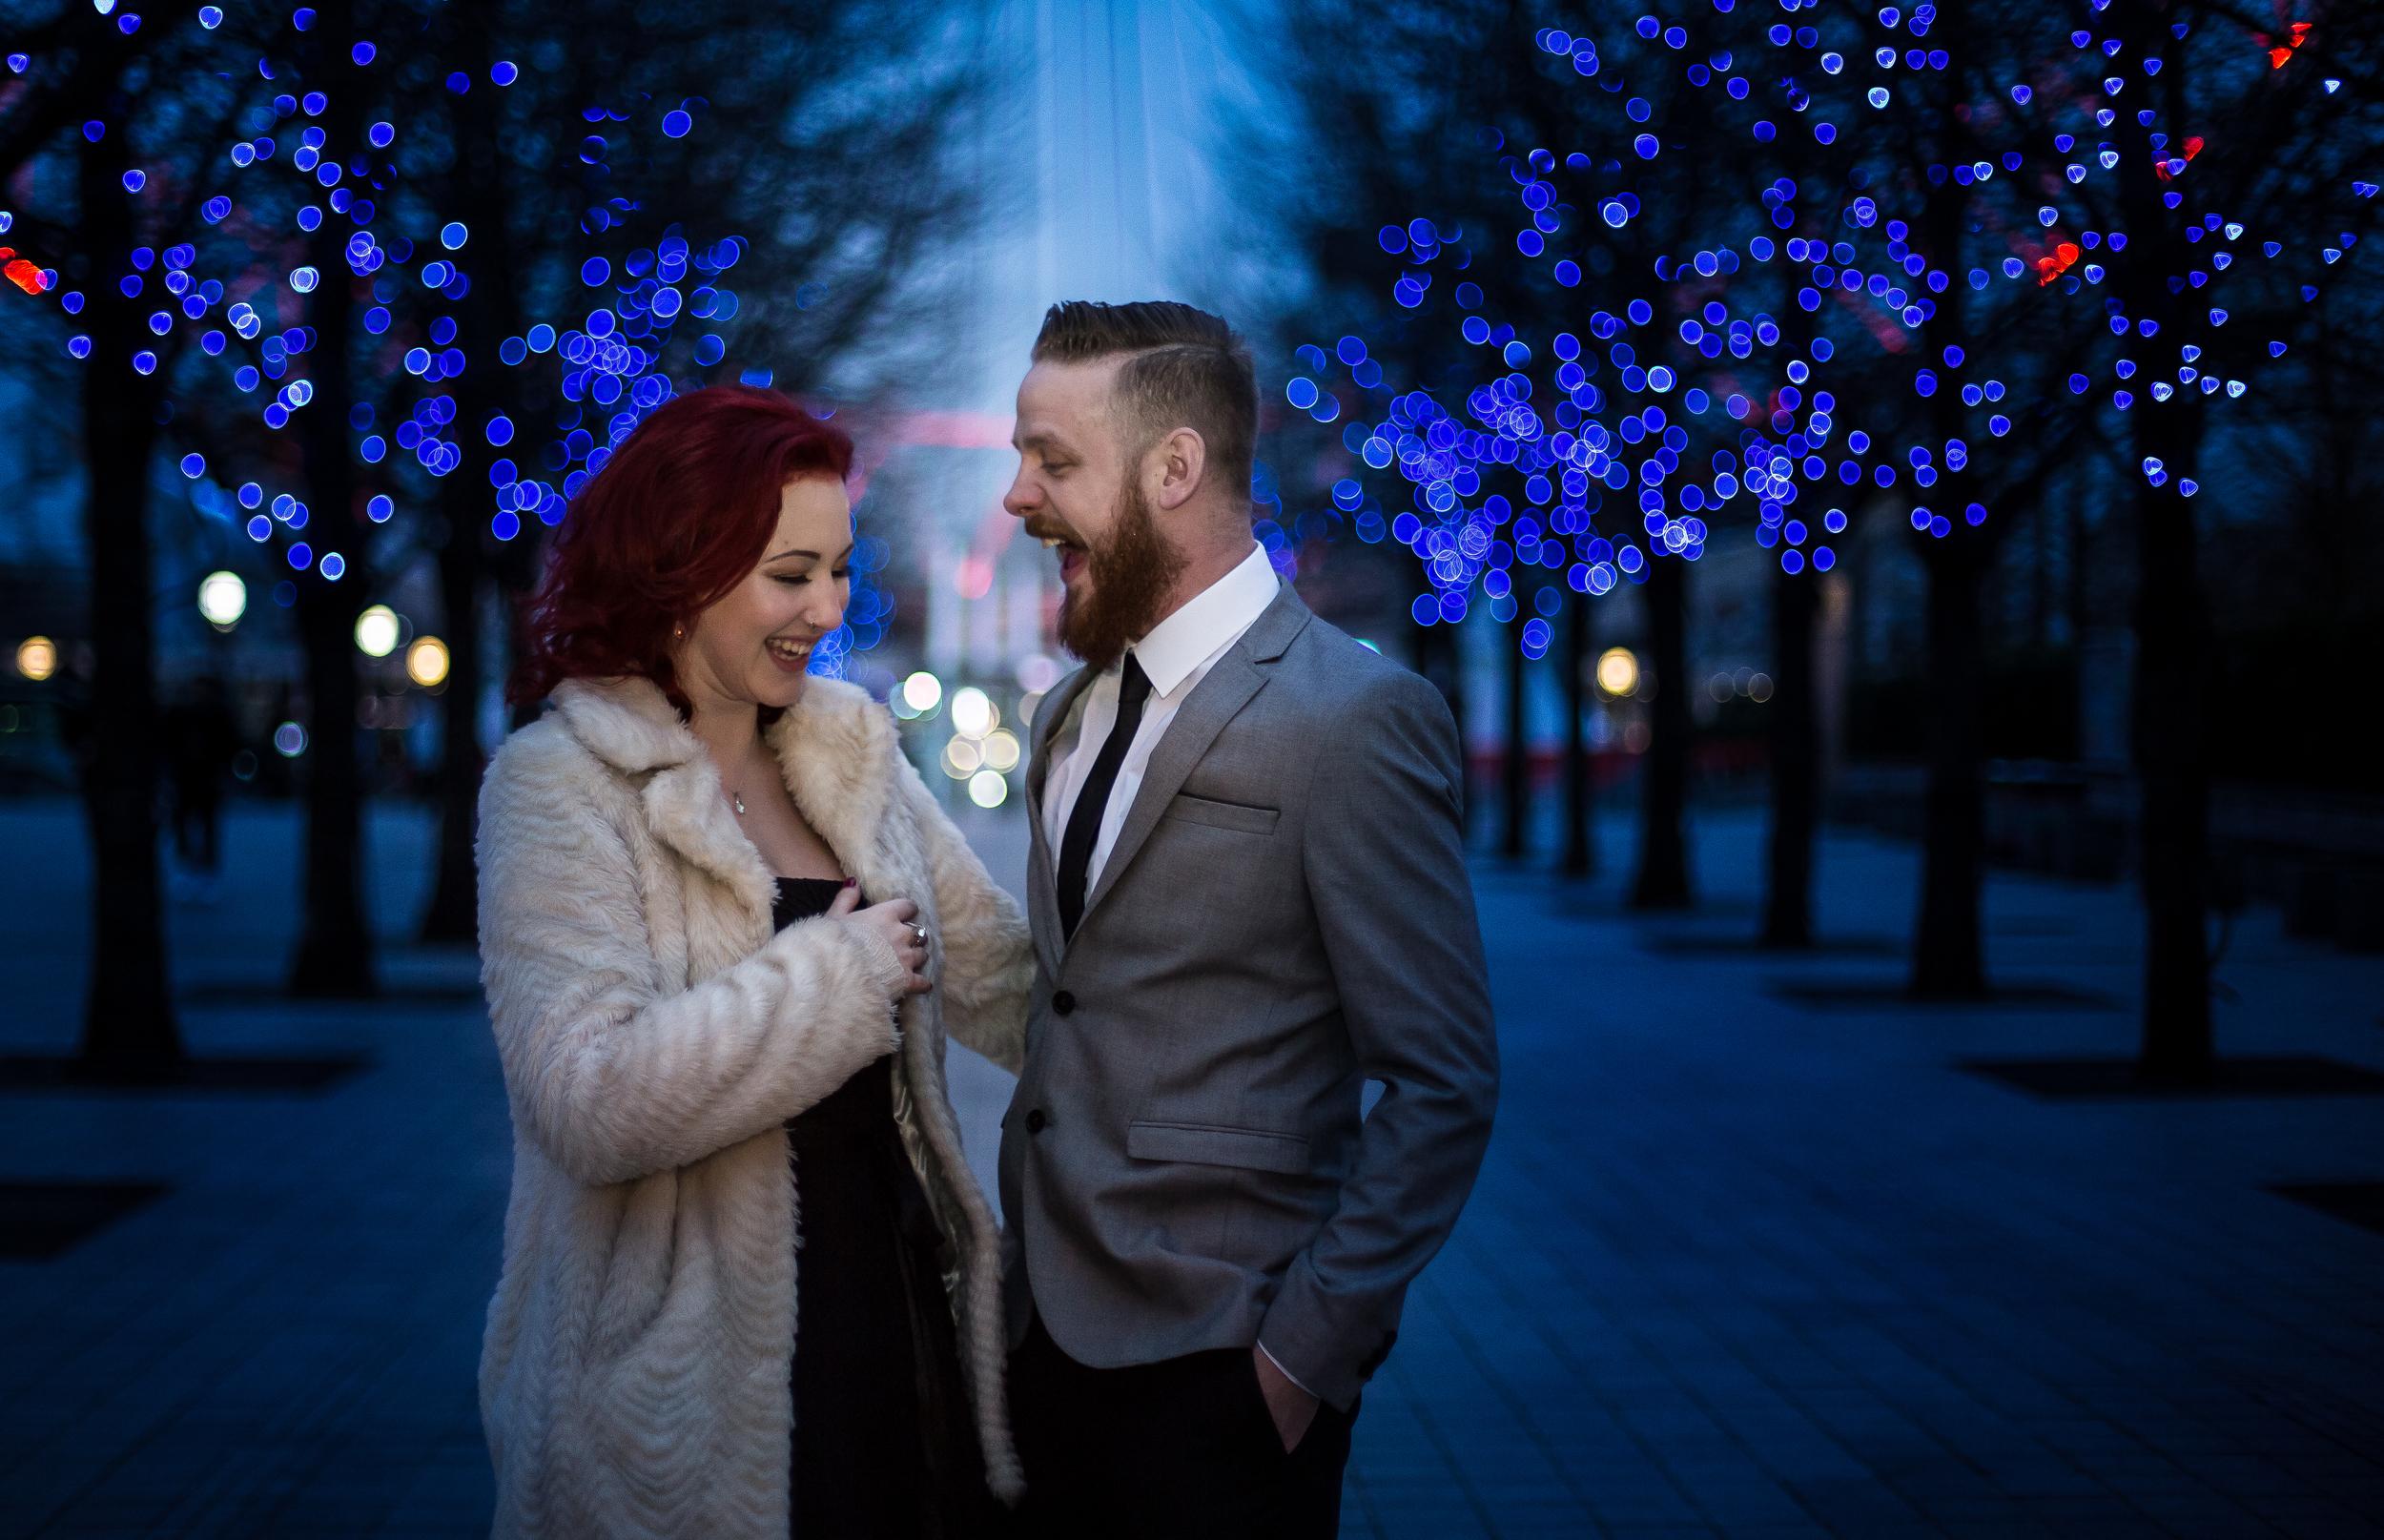 westminster-engagement-adam-rowley-wedding-photography-london-eye-1